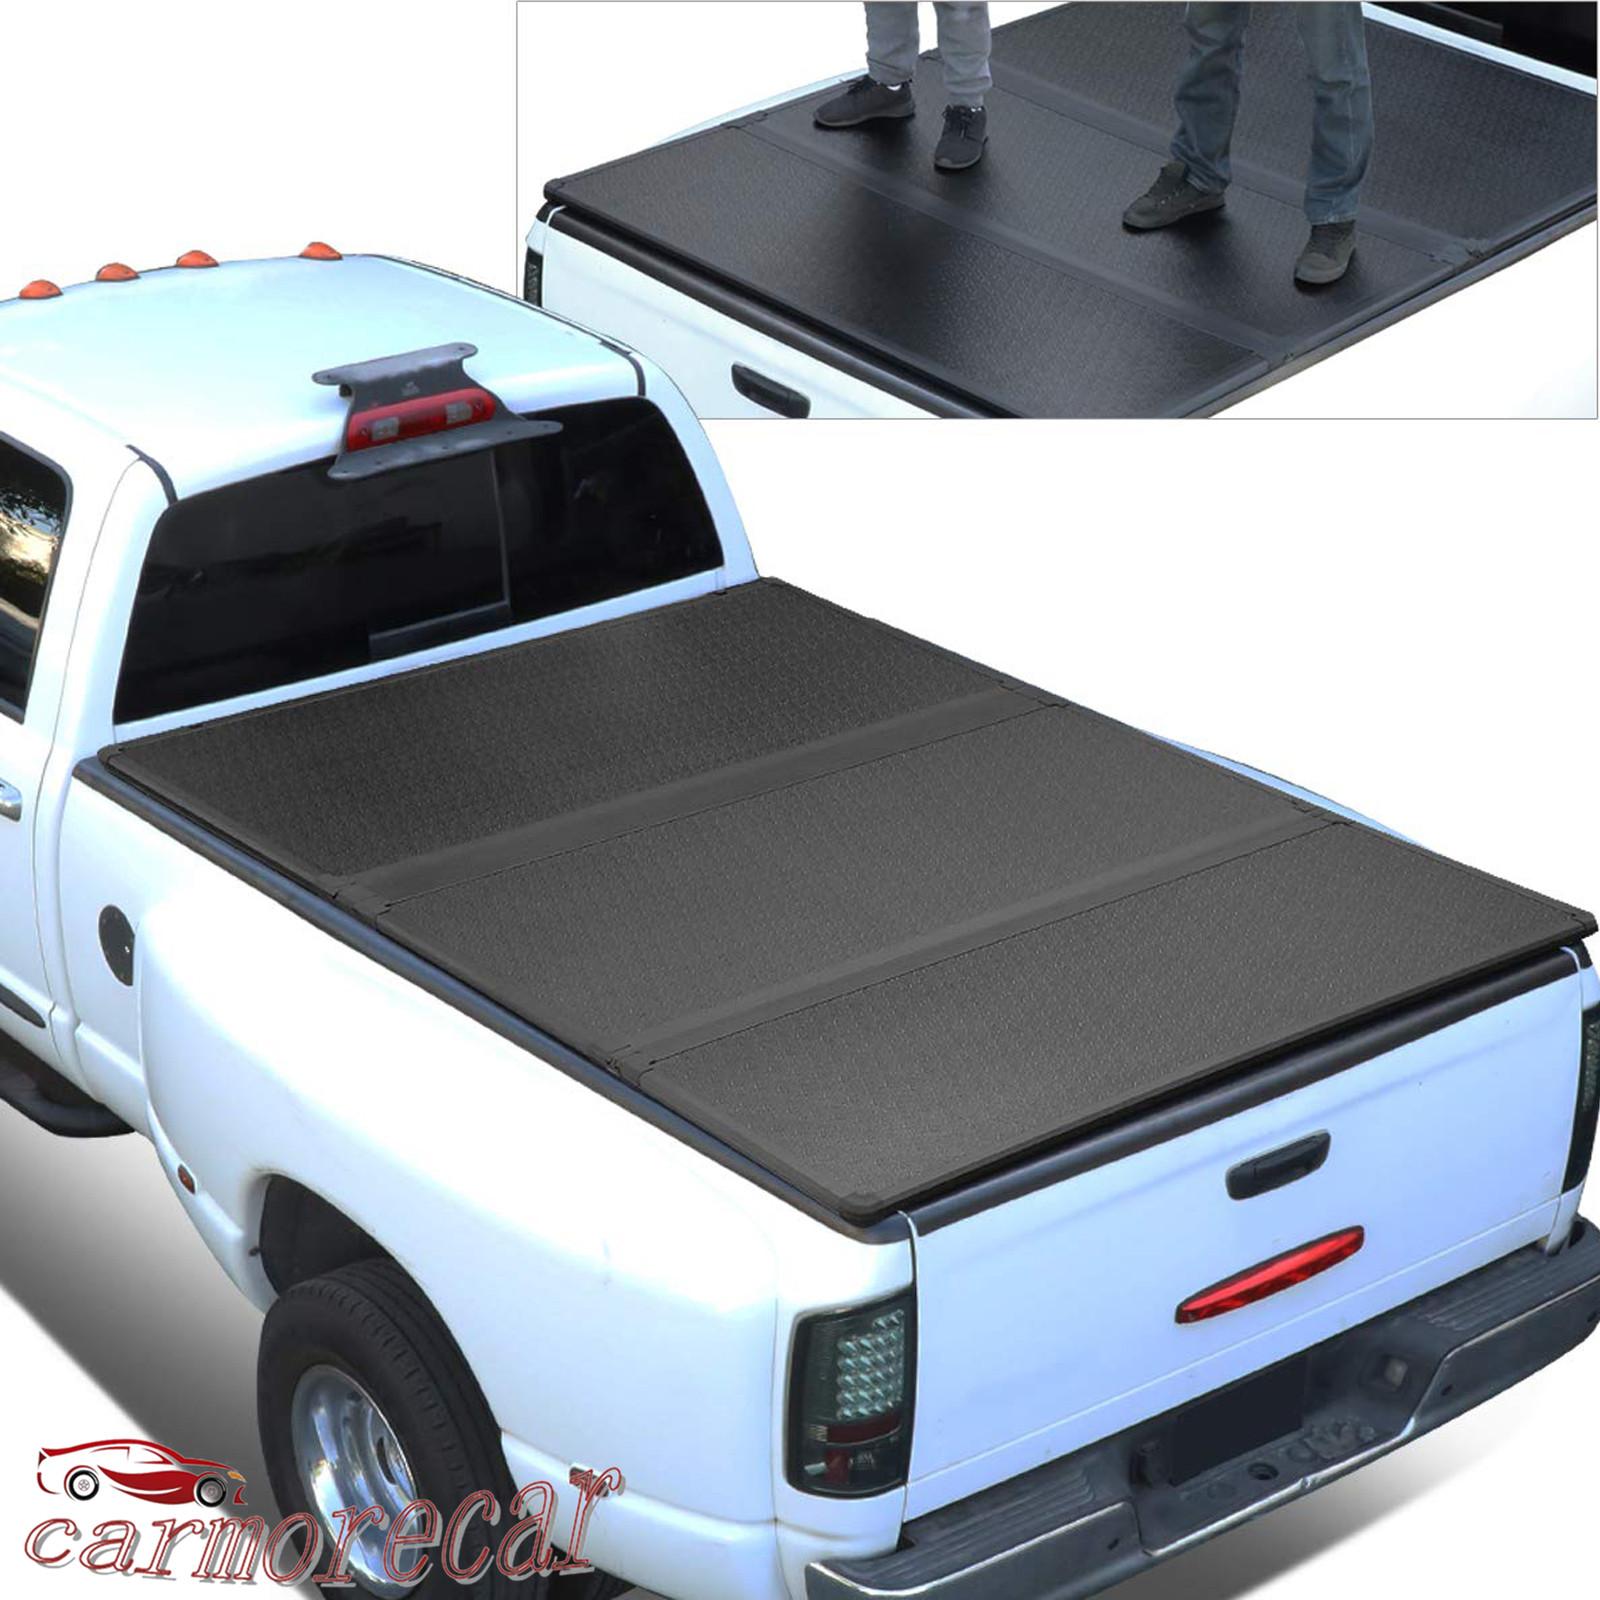 Hard Tri Fold Truck Bed Tonneau Cover 6 6 78 8 For Silverado